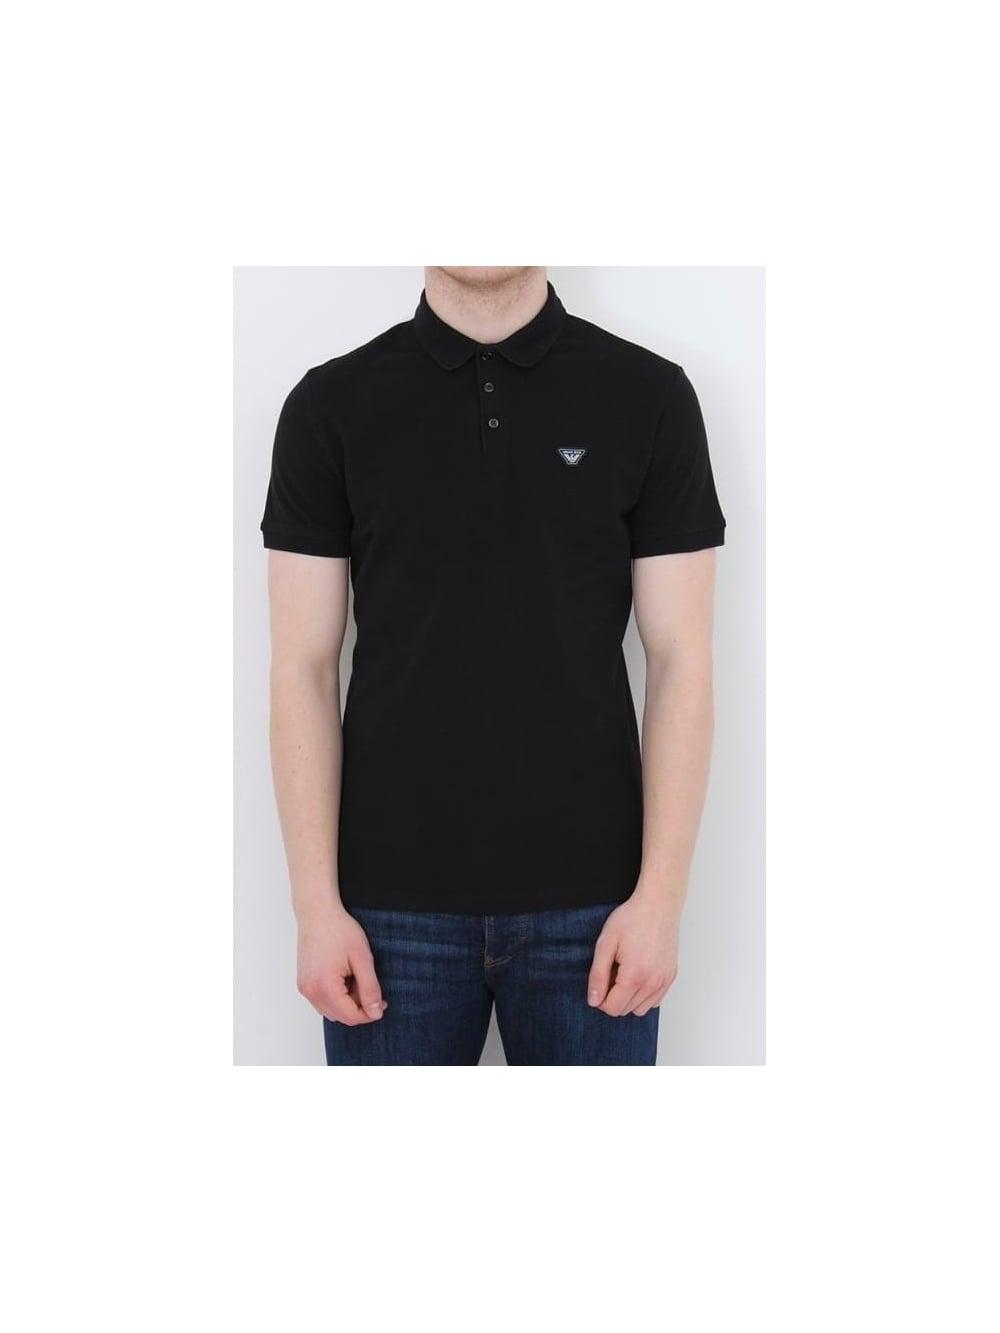 Armani Jeans Classic Logo Polo In Black - Northern Threads cfad53ab6